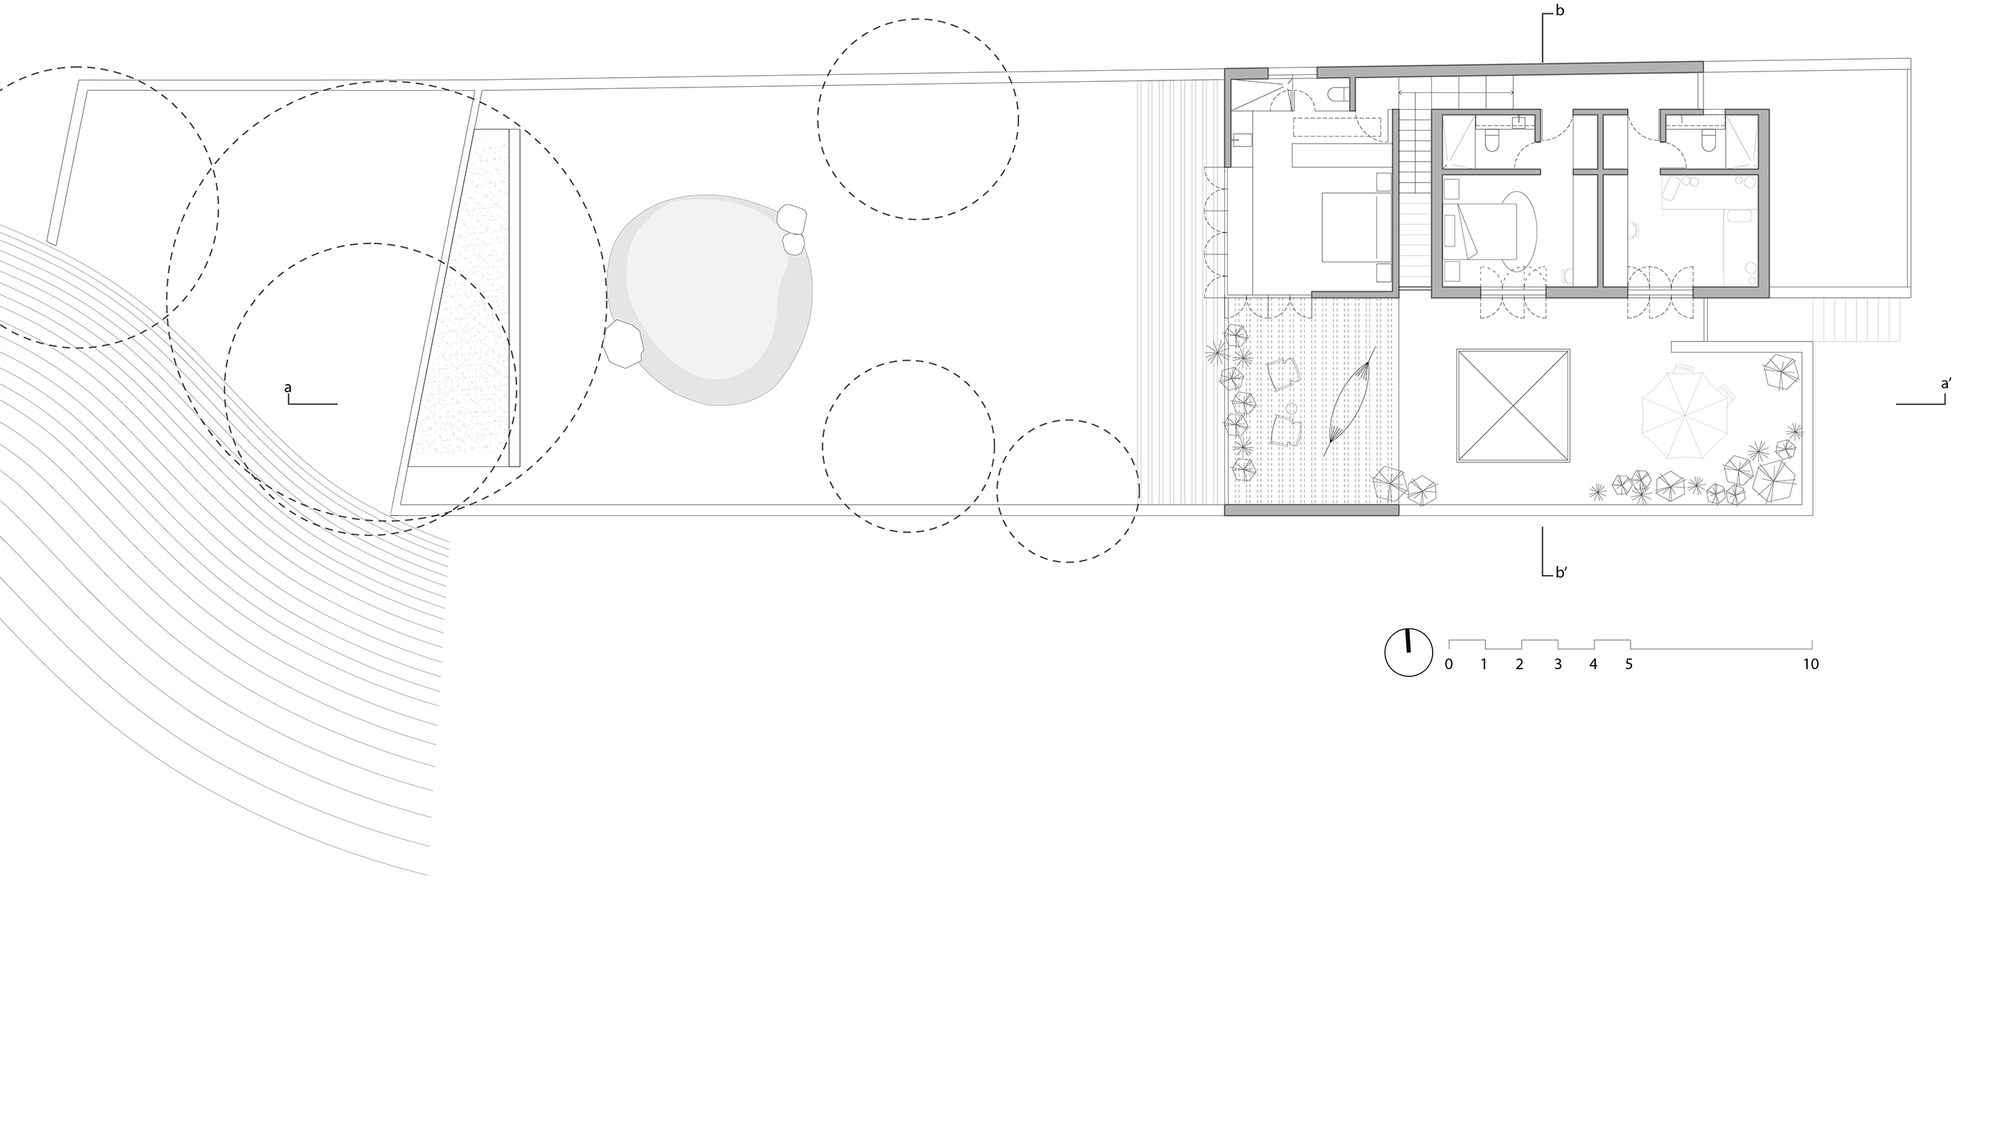 Galer a de casa albino ortega rozana montiel estudio for Arq estudio de arquitectura